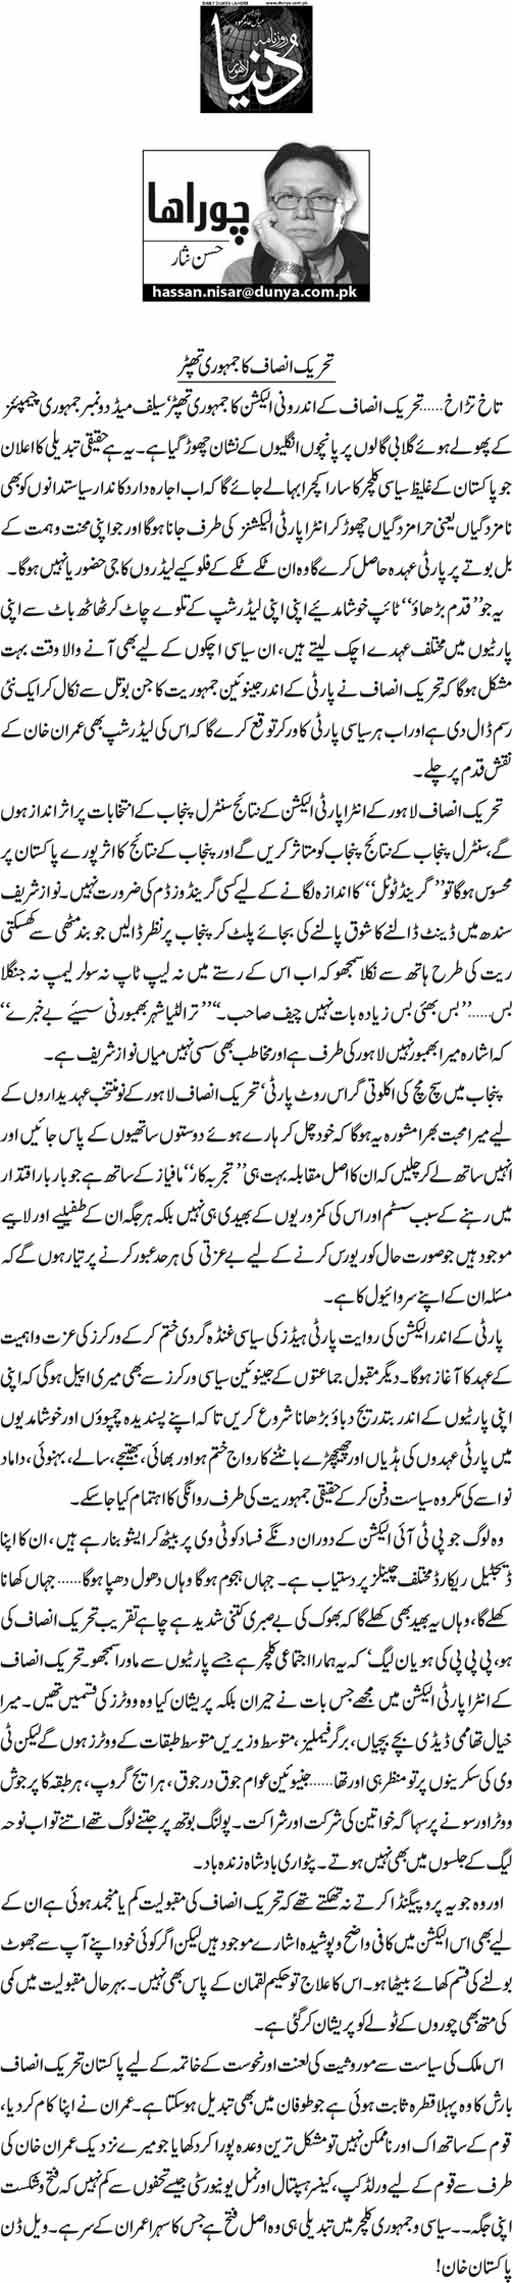 Tehreek e Insaaf ka jumhoori thappar - Hassan Nisar